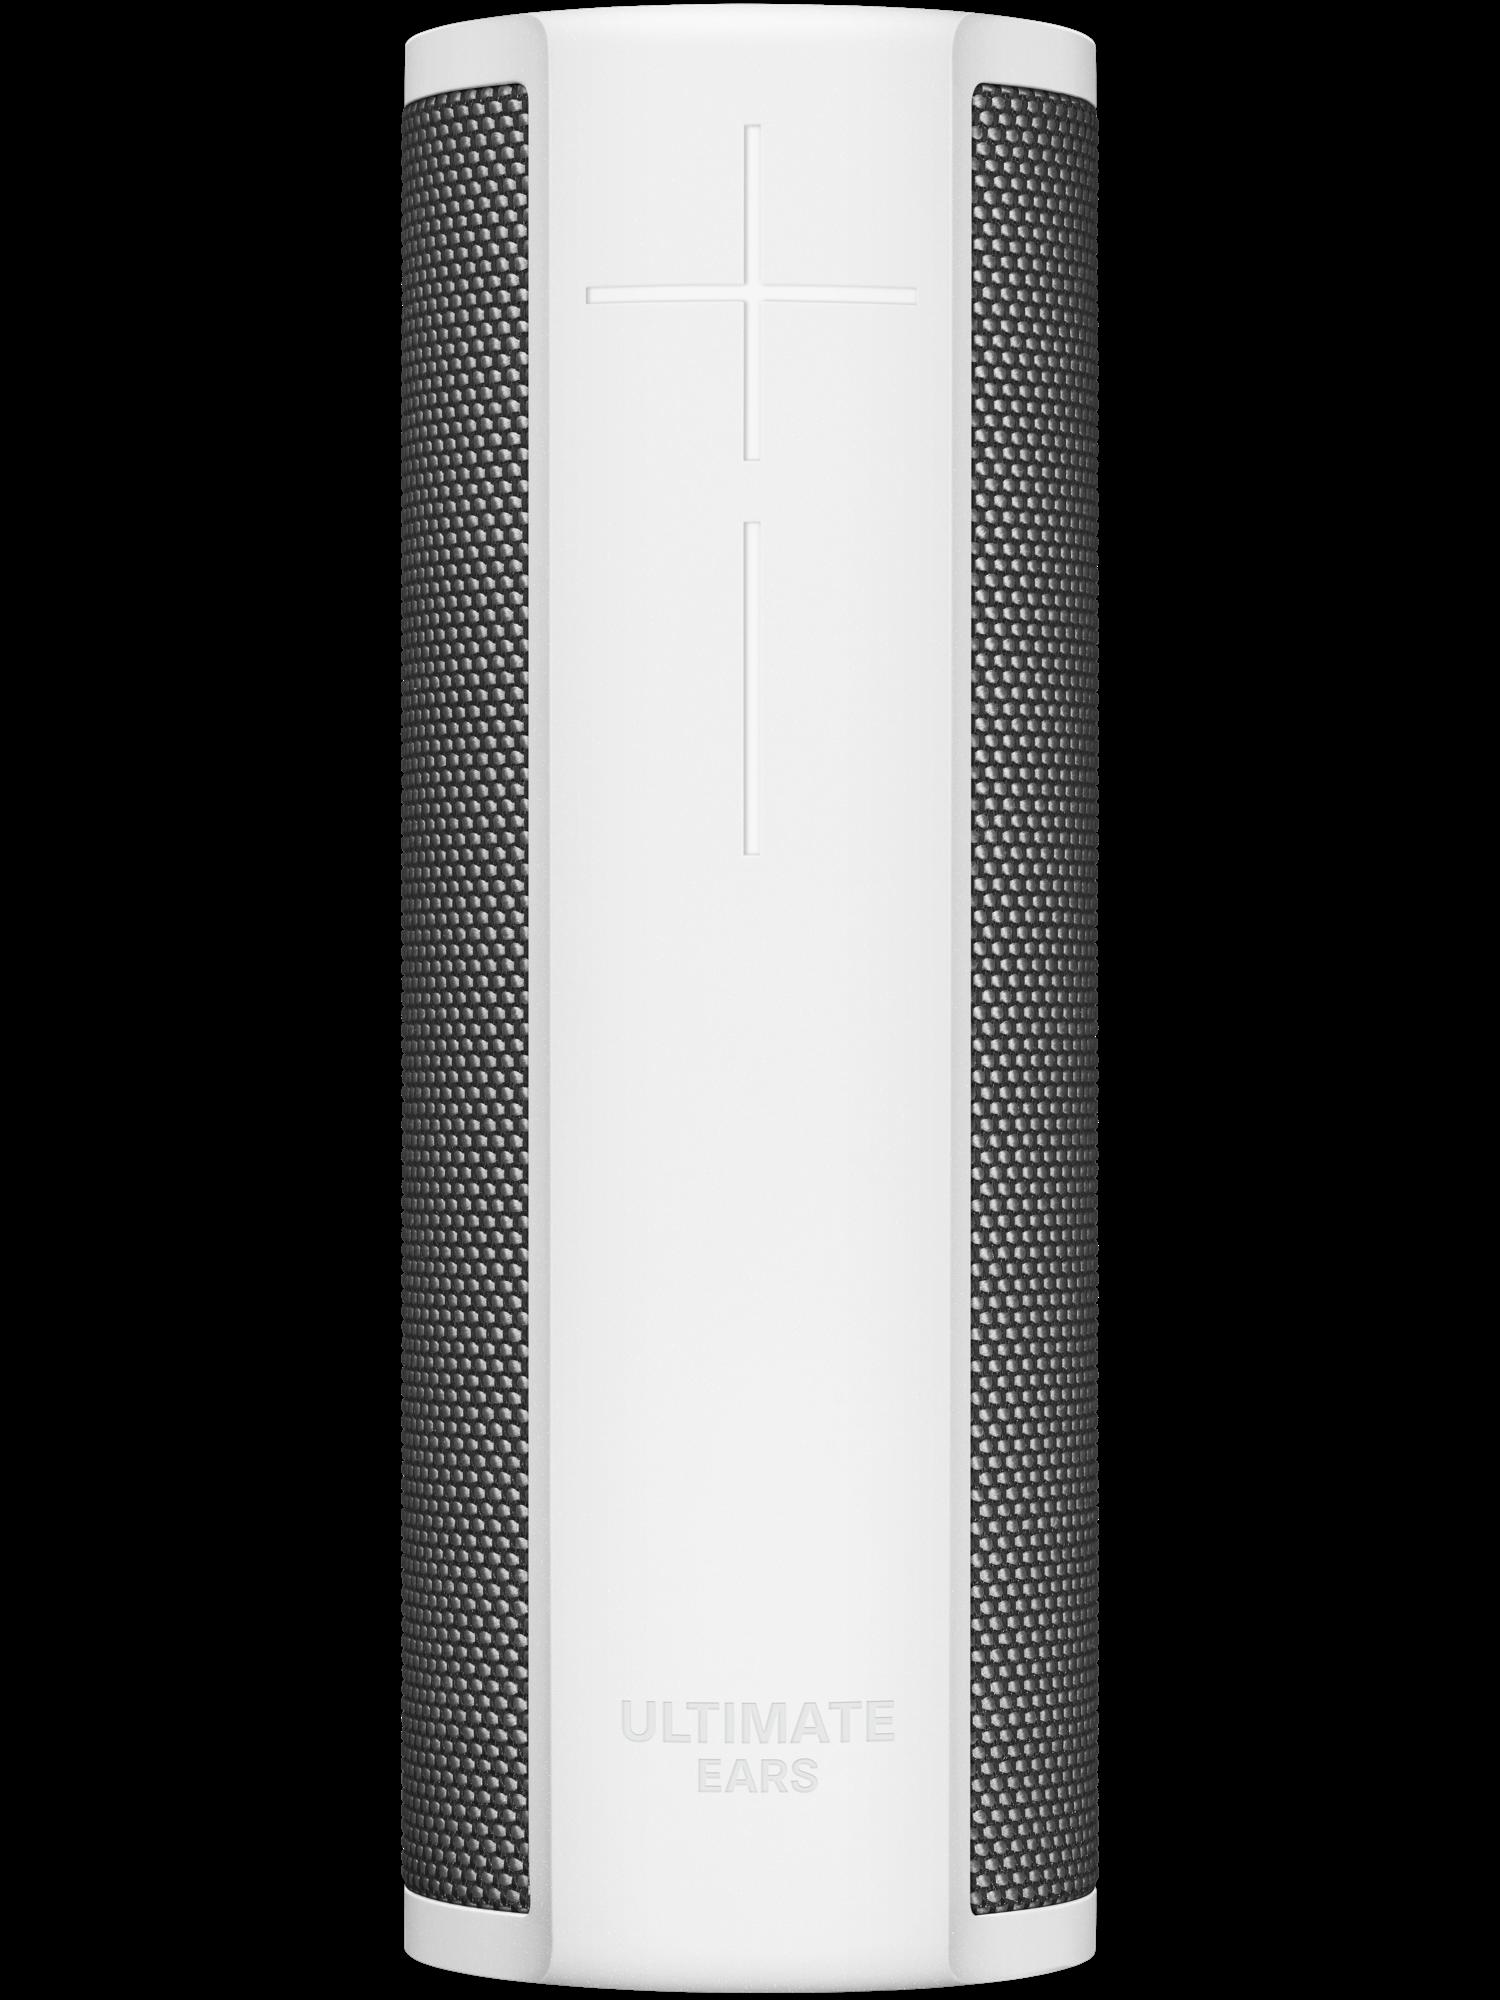 Merlot Ultimate Ears Blast Bluetooth Speaker Renewed Power Up